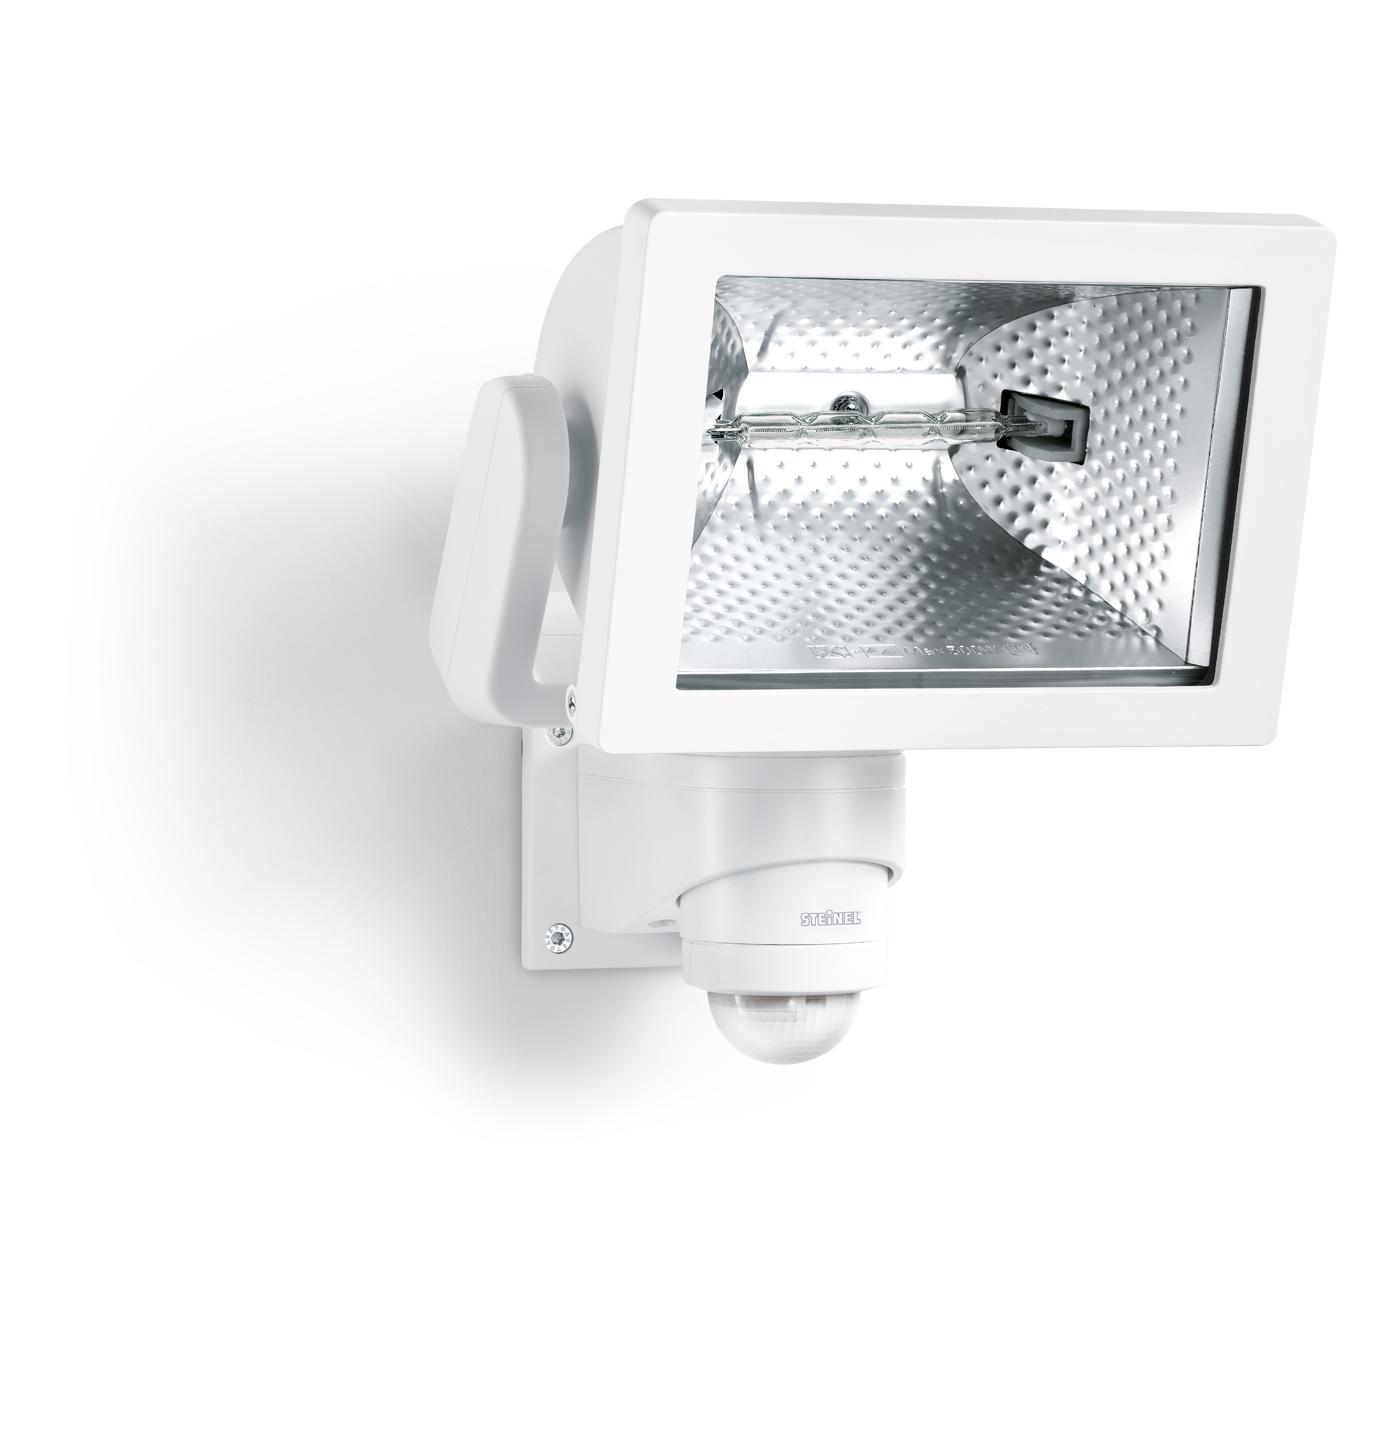 Steinel sensor halogenstrahler hs 500 duo wei 633516 for Hausfronten modern